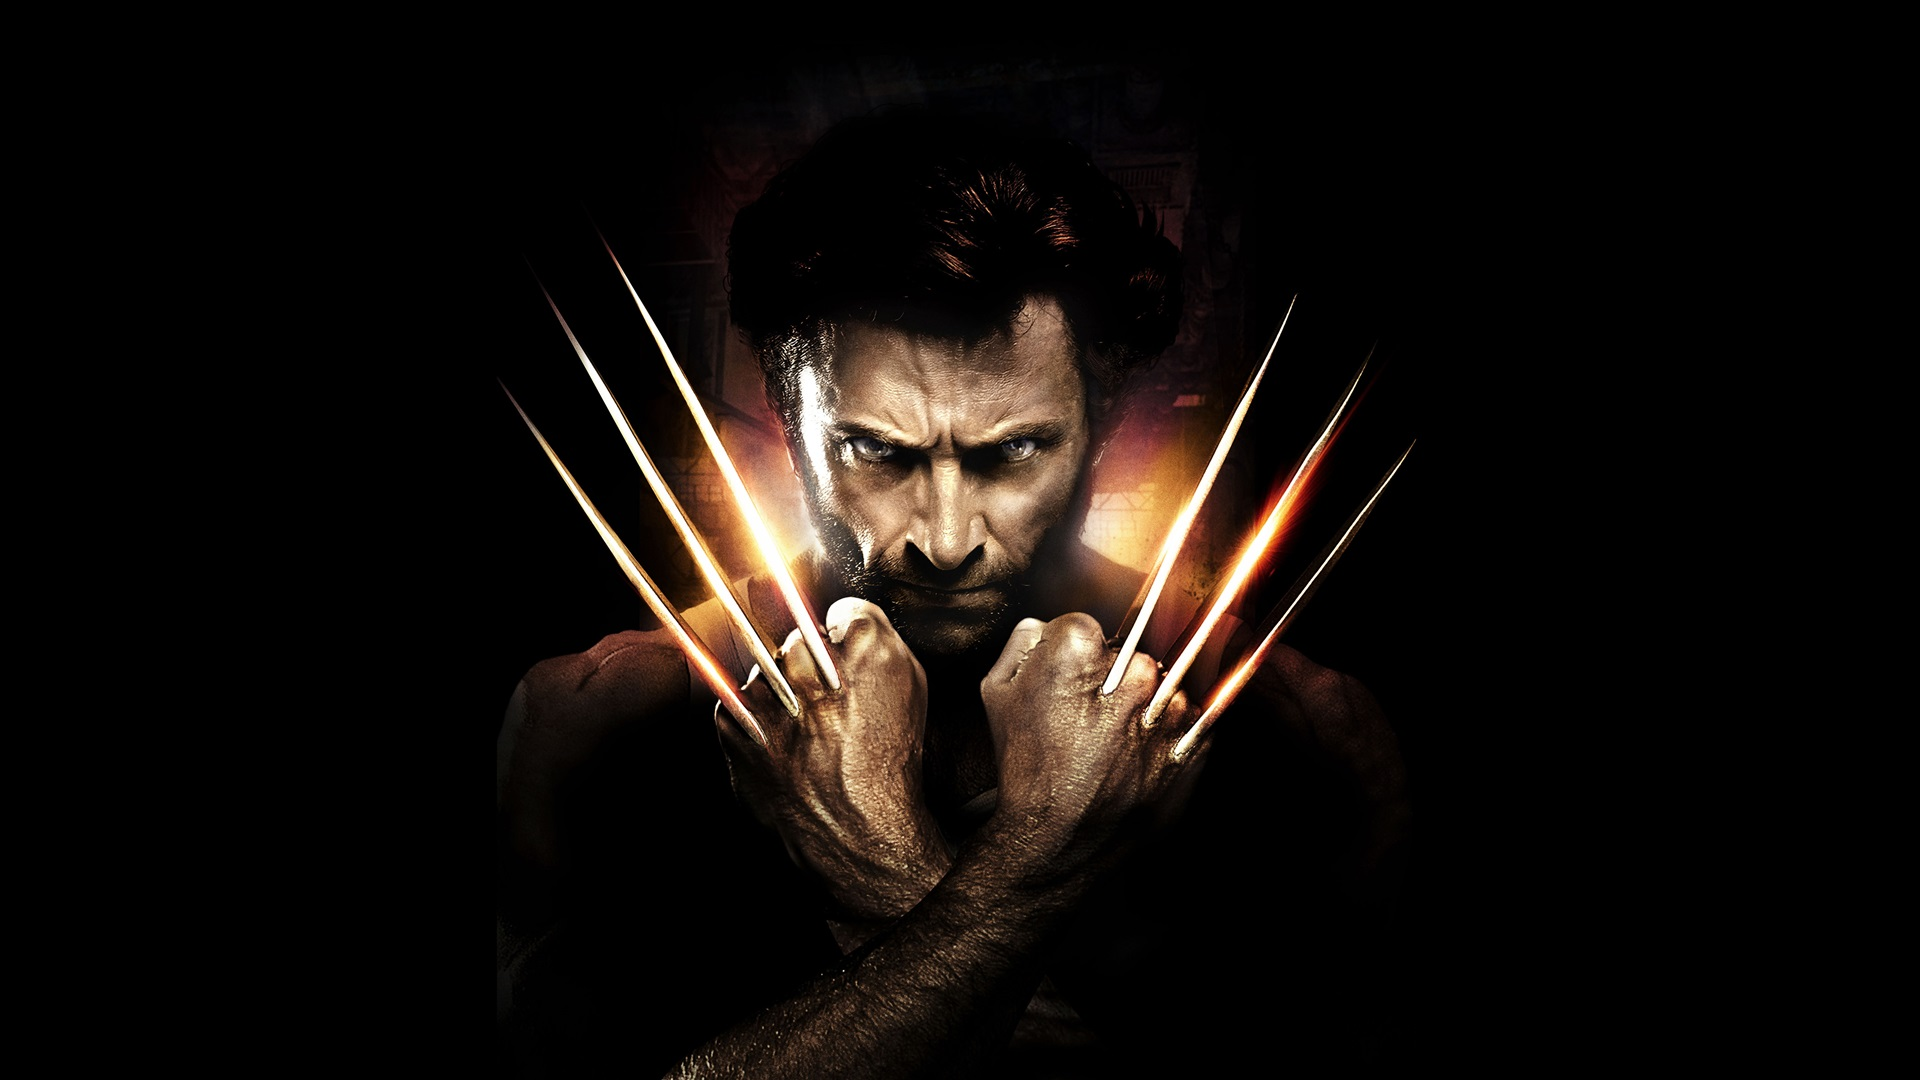 X Men Hugh Jackman Wolverine 1080x1920 Iphone 8 7 6 6s